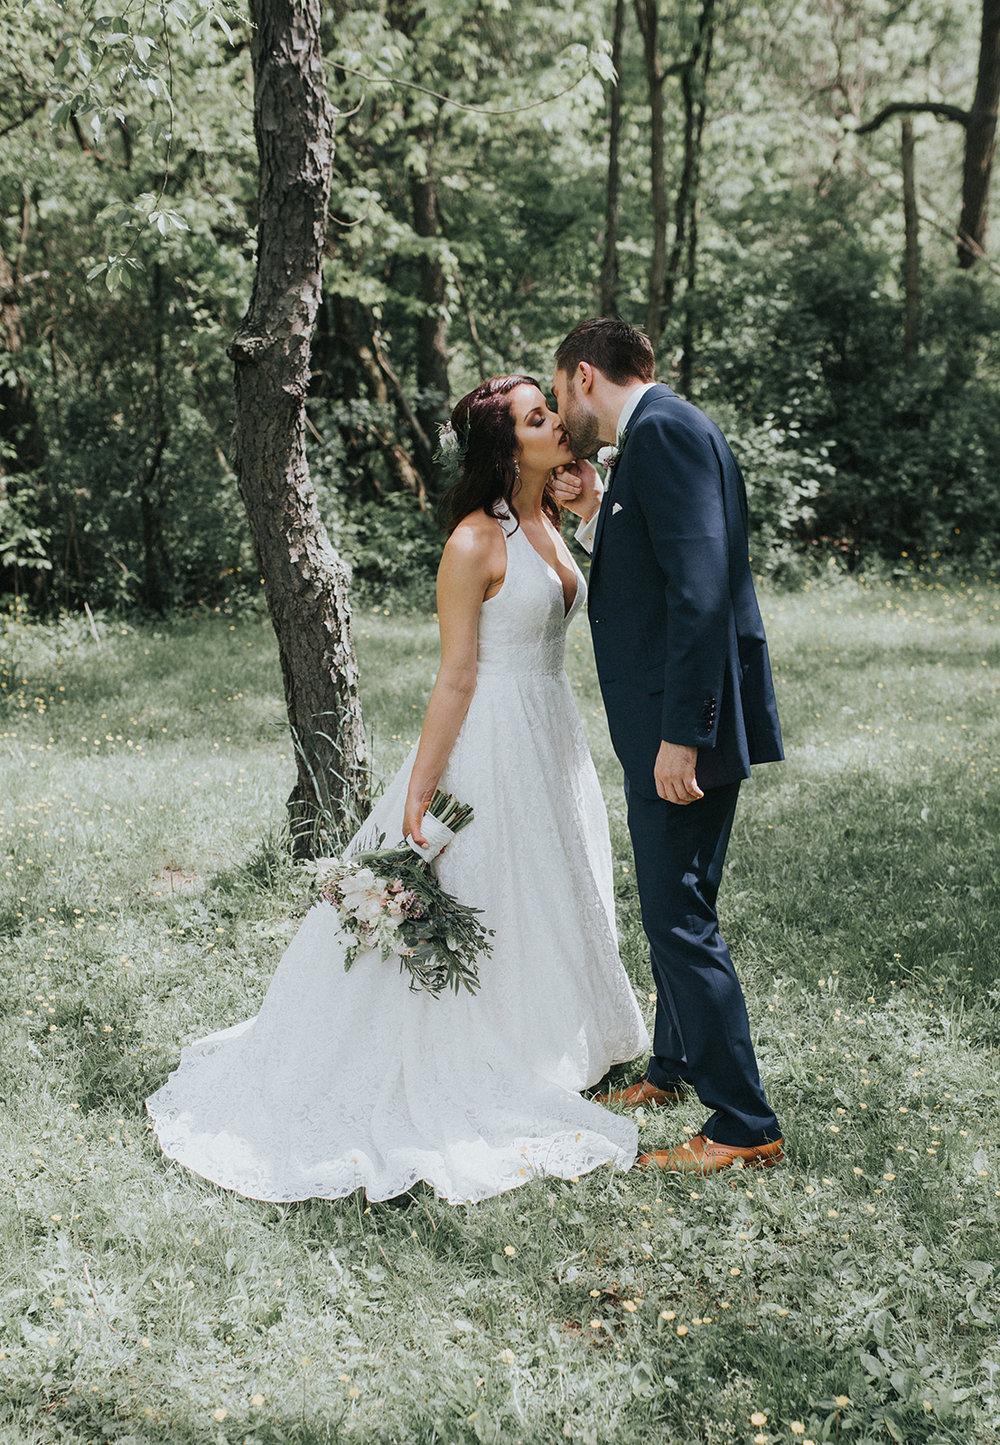 Pittsburgh Wedding Planner Jessica Garda Events Self-Uniting Wedding at SNPJ Resort Ashley Giffin Photography (1).jpg